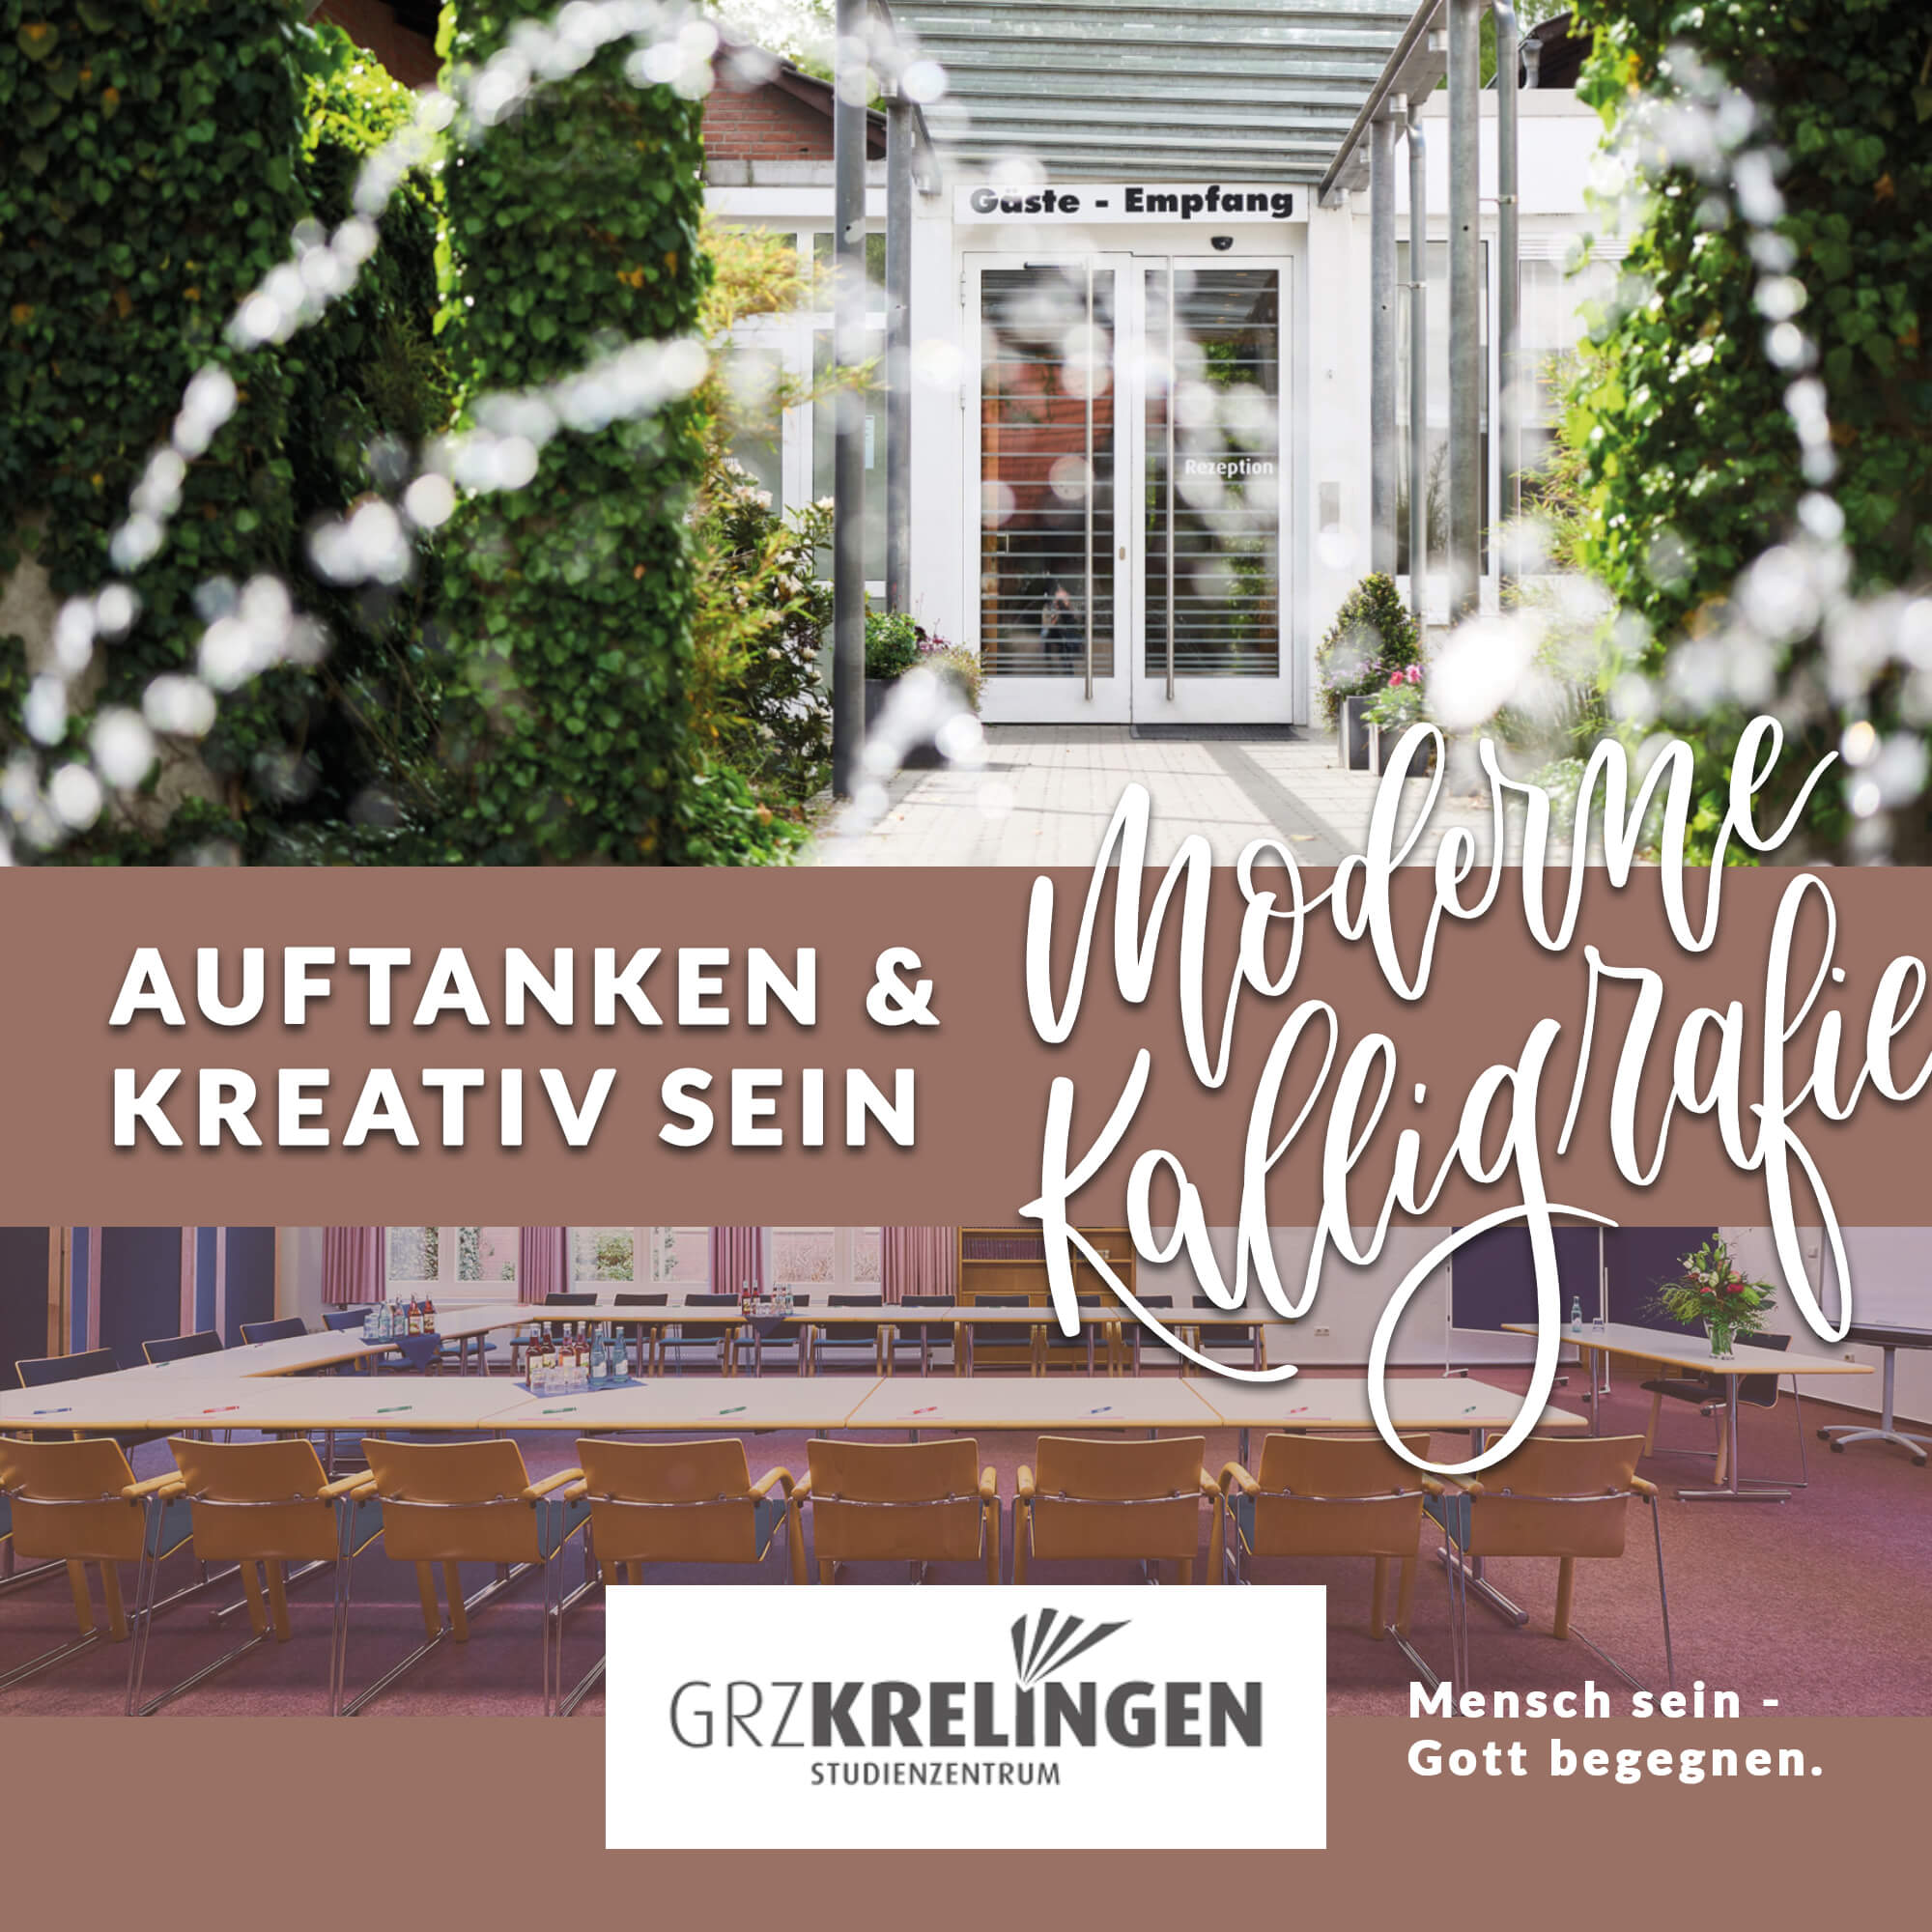 Moderne Kalligraphie Workshop im Kliemannsland Hamburg Bremen Krelingen Lüneburger Heide GRZ Workshops